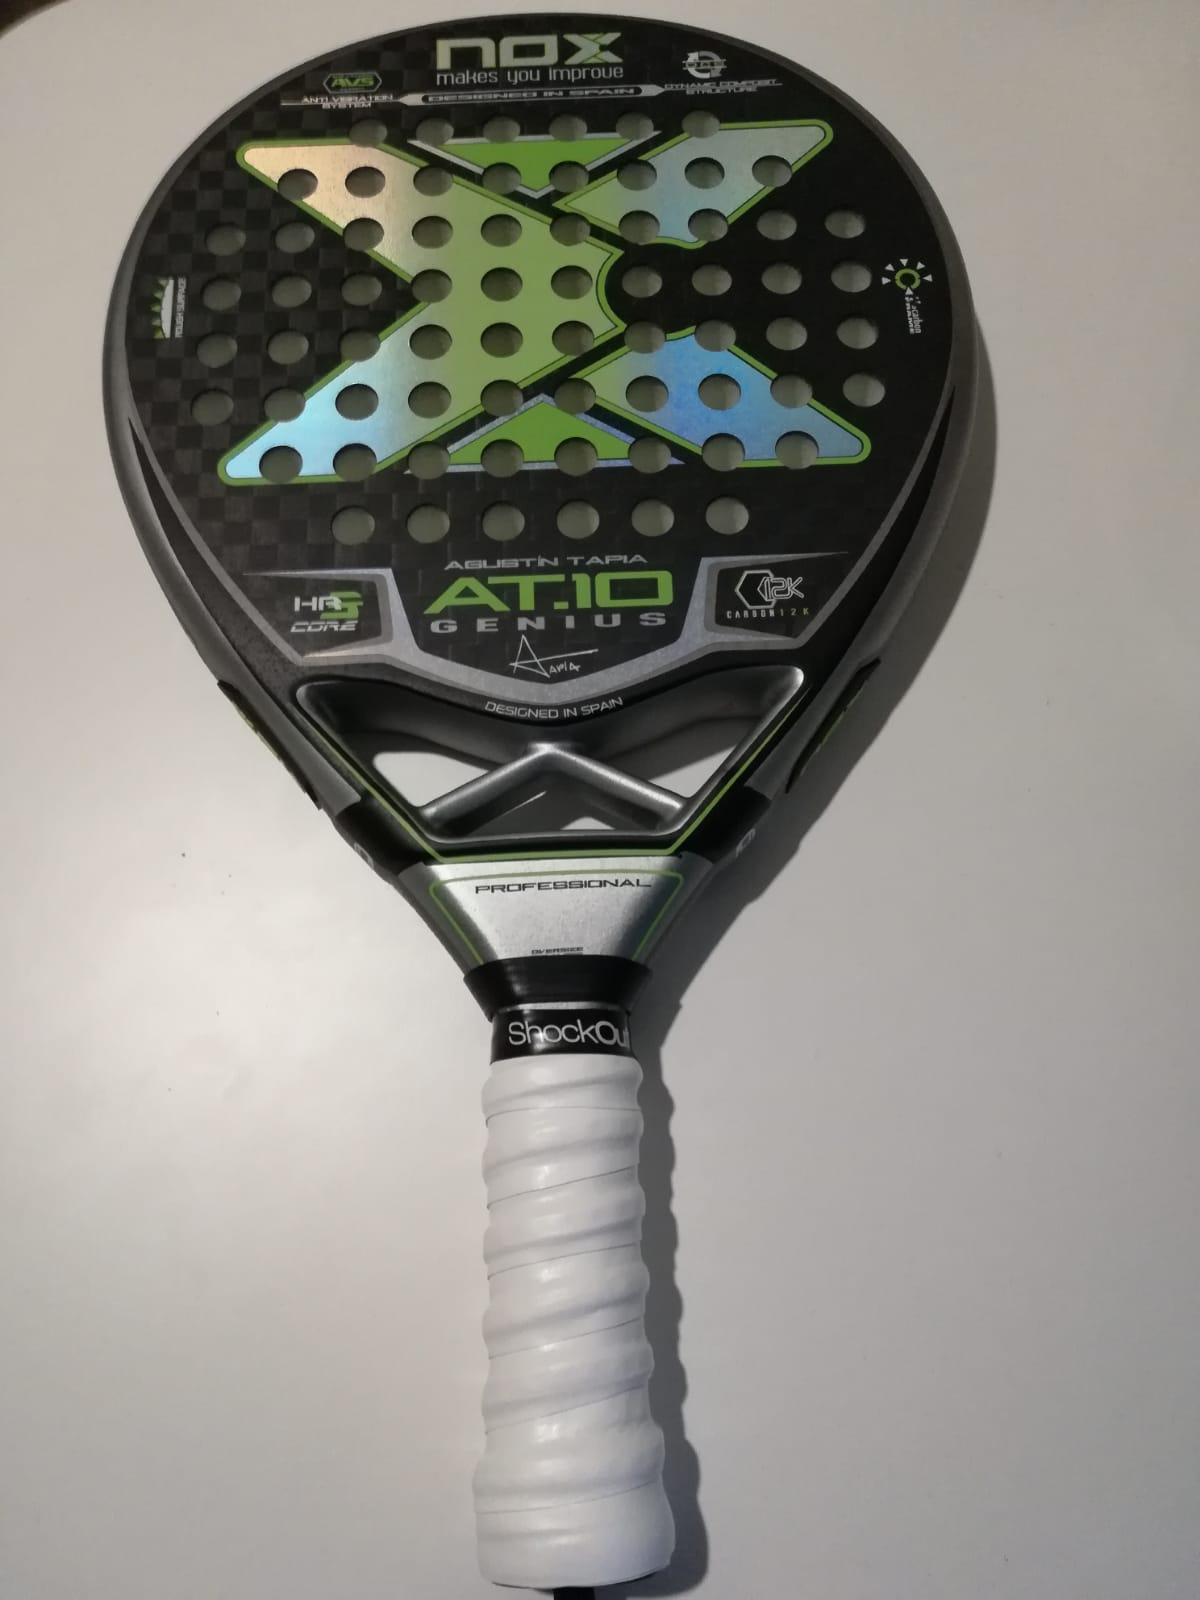 shockout grip nox padel racket